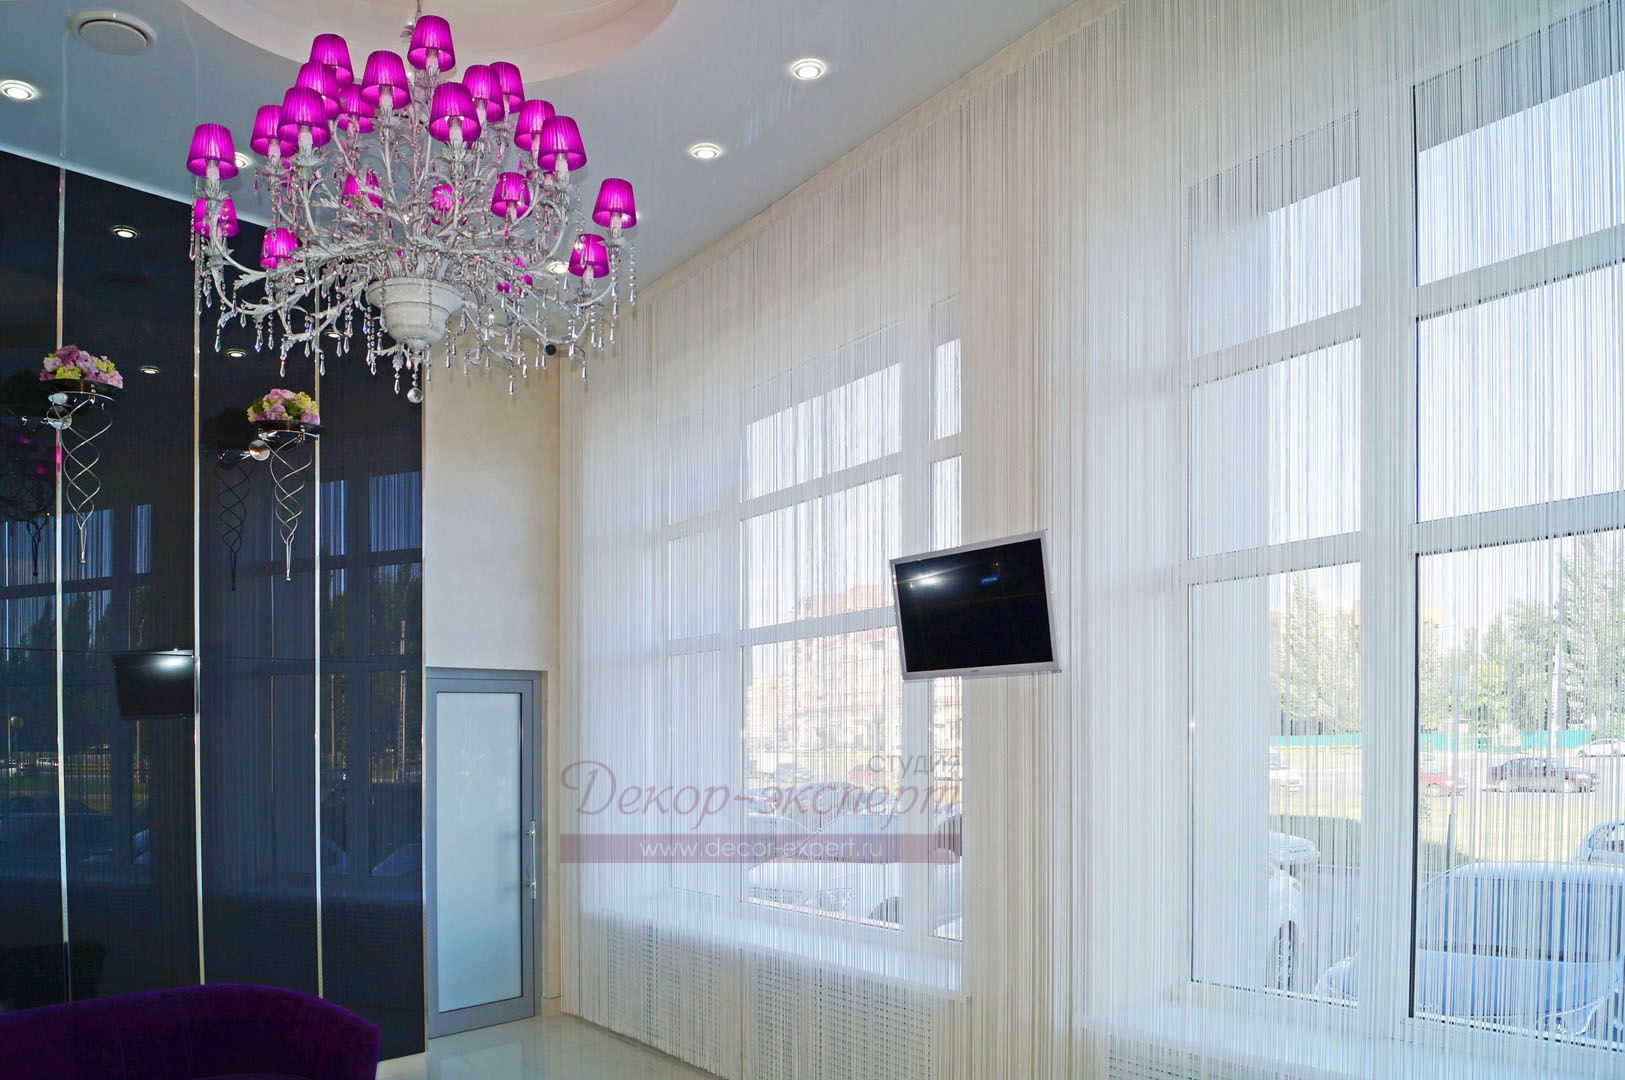 kiseya-foto-v-interiere-salona-krasoti-3